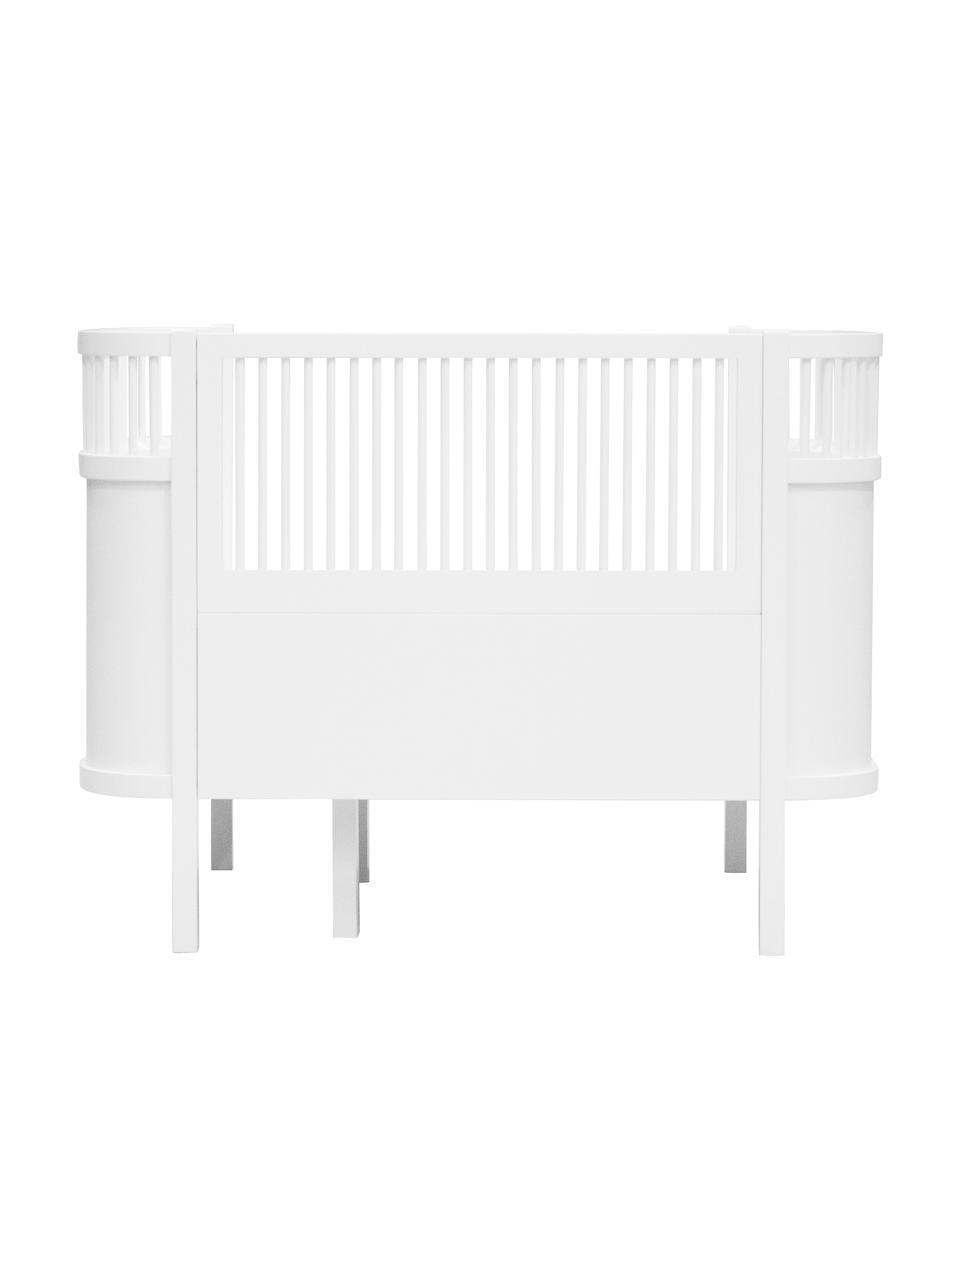 Baby-Bett Junior, Birkenholz, lackiert, Weiß, 115 x 88 cm